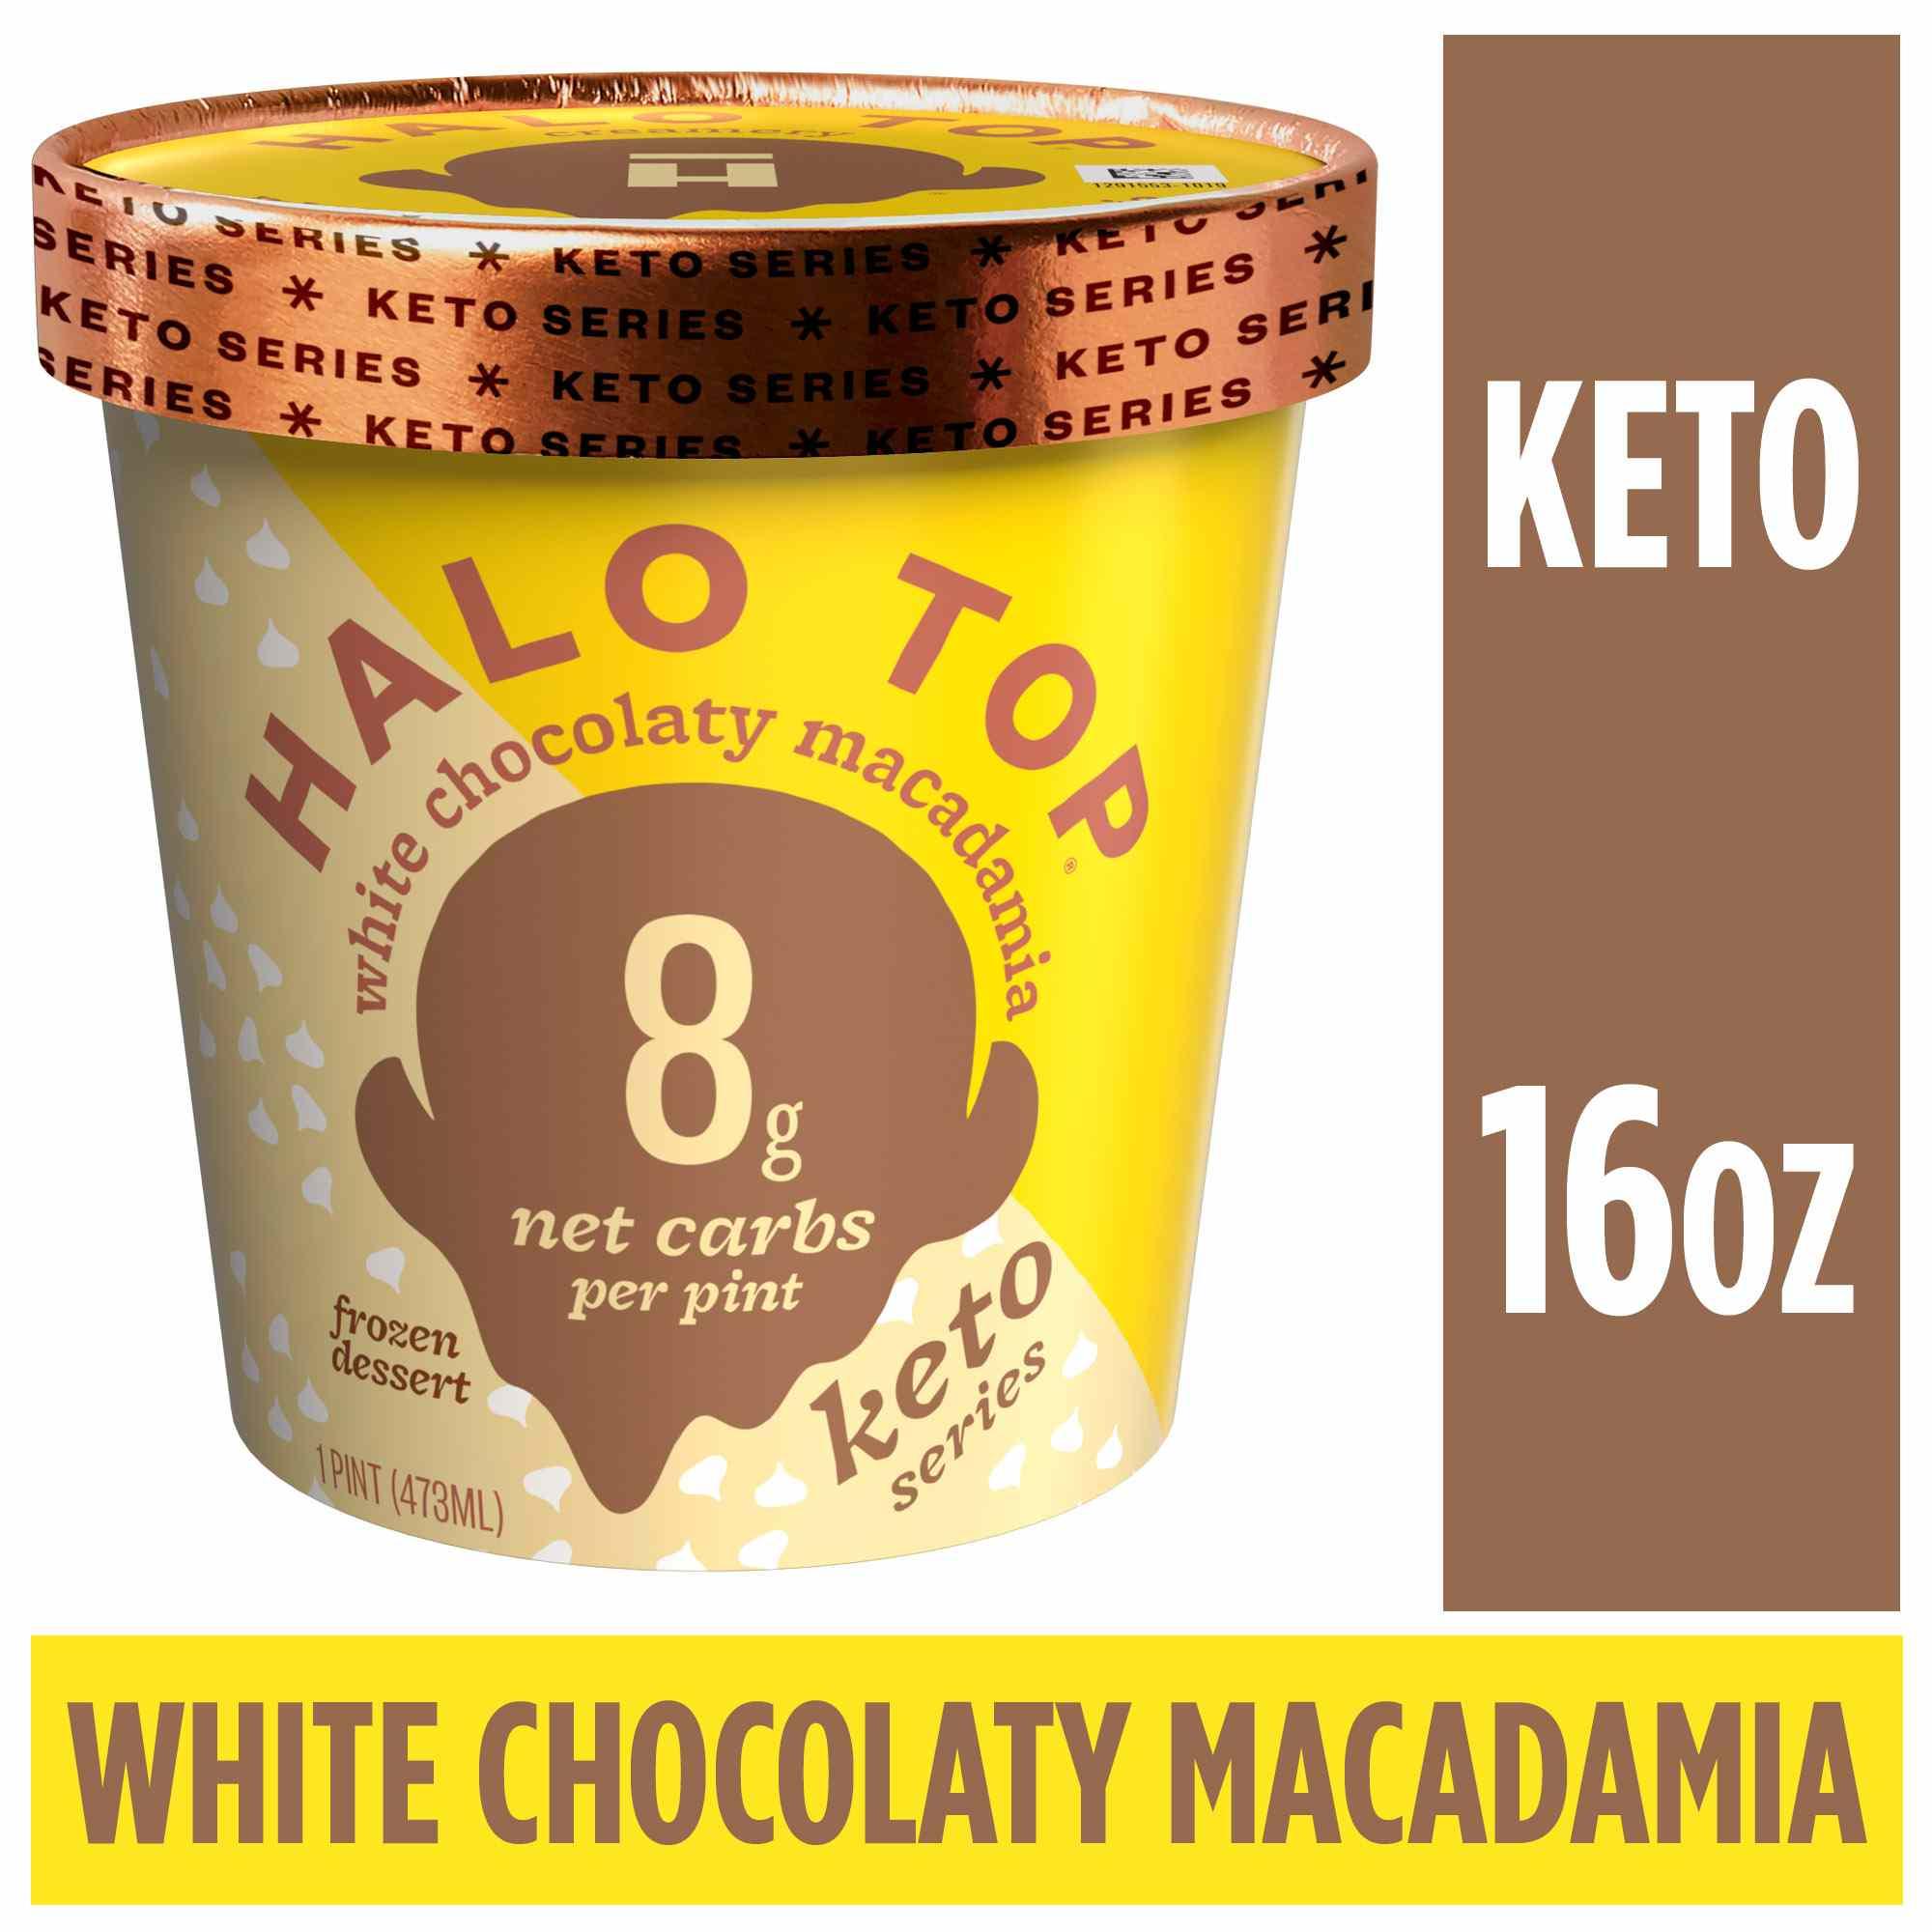 halo-top-white-chocolaty-macadamia-ice-cream